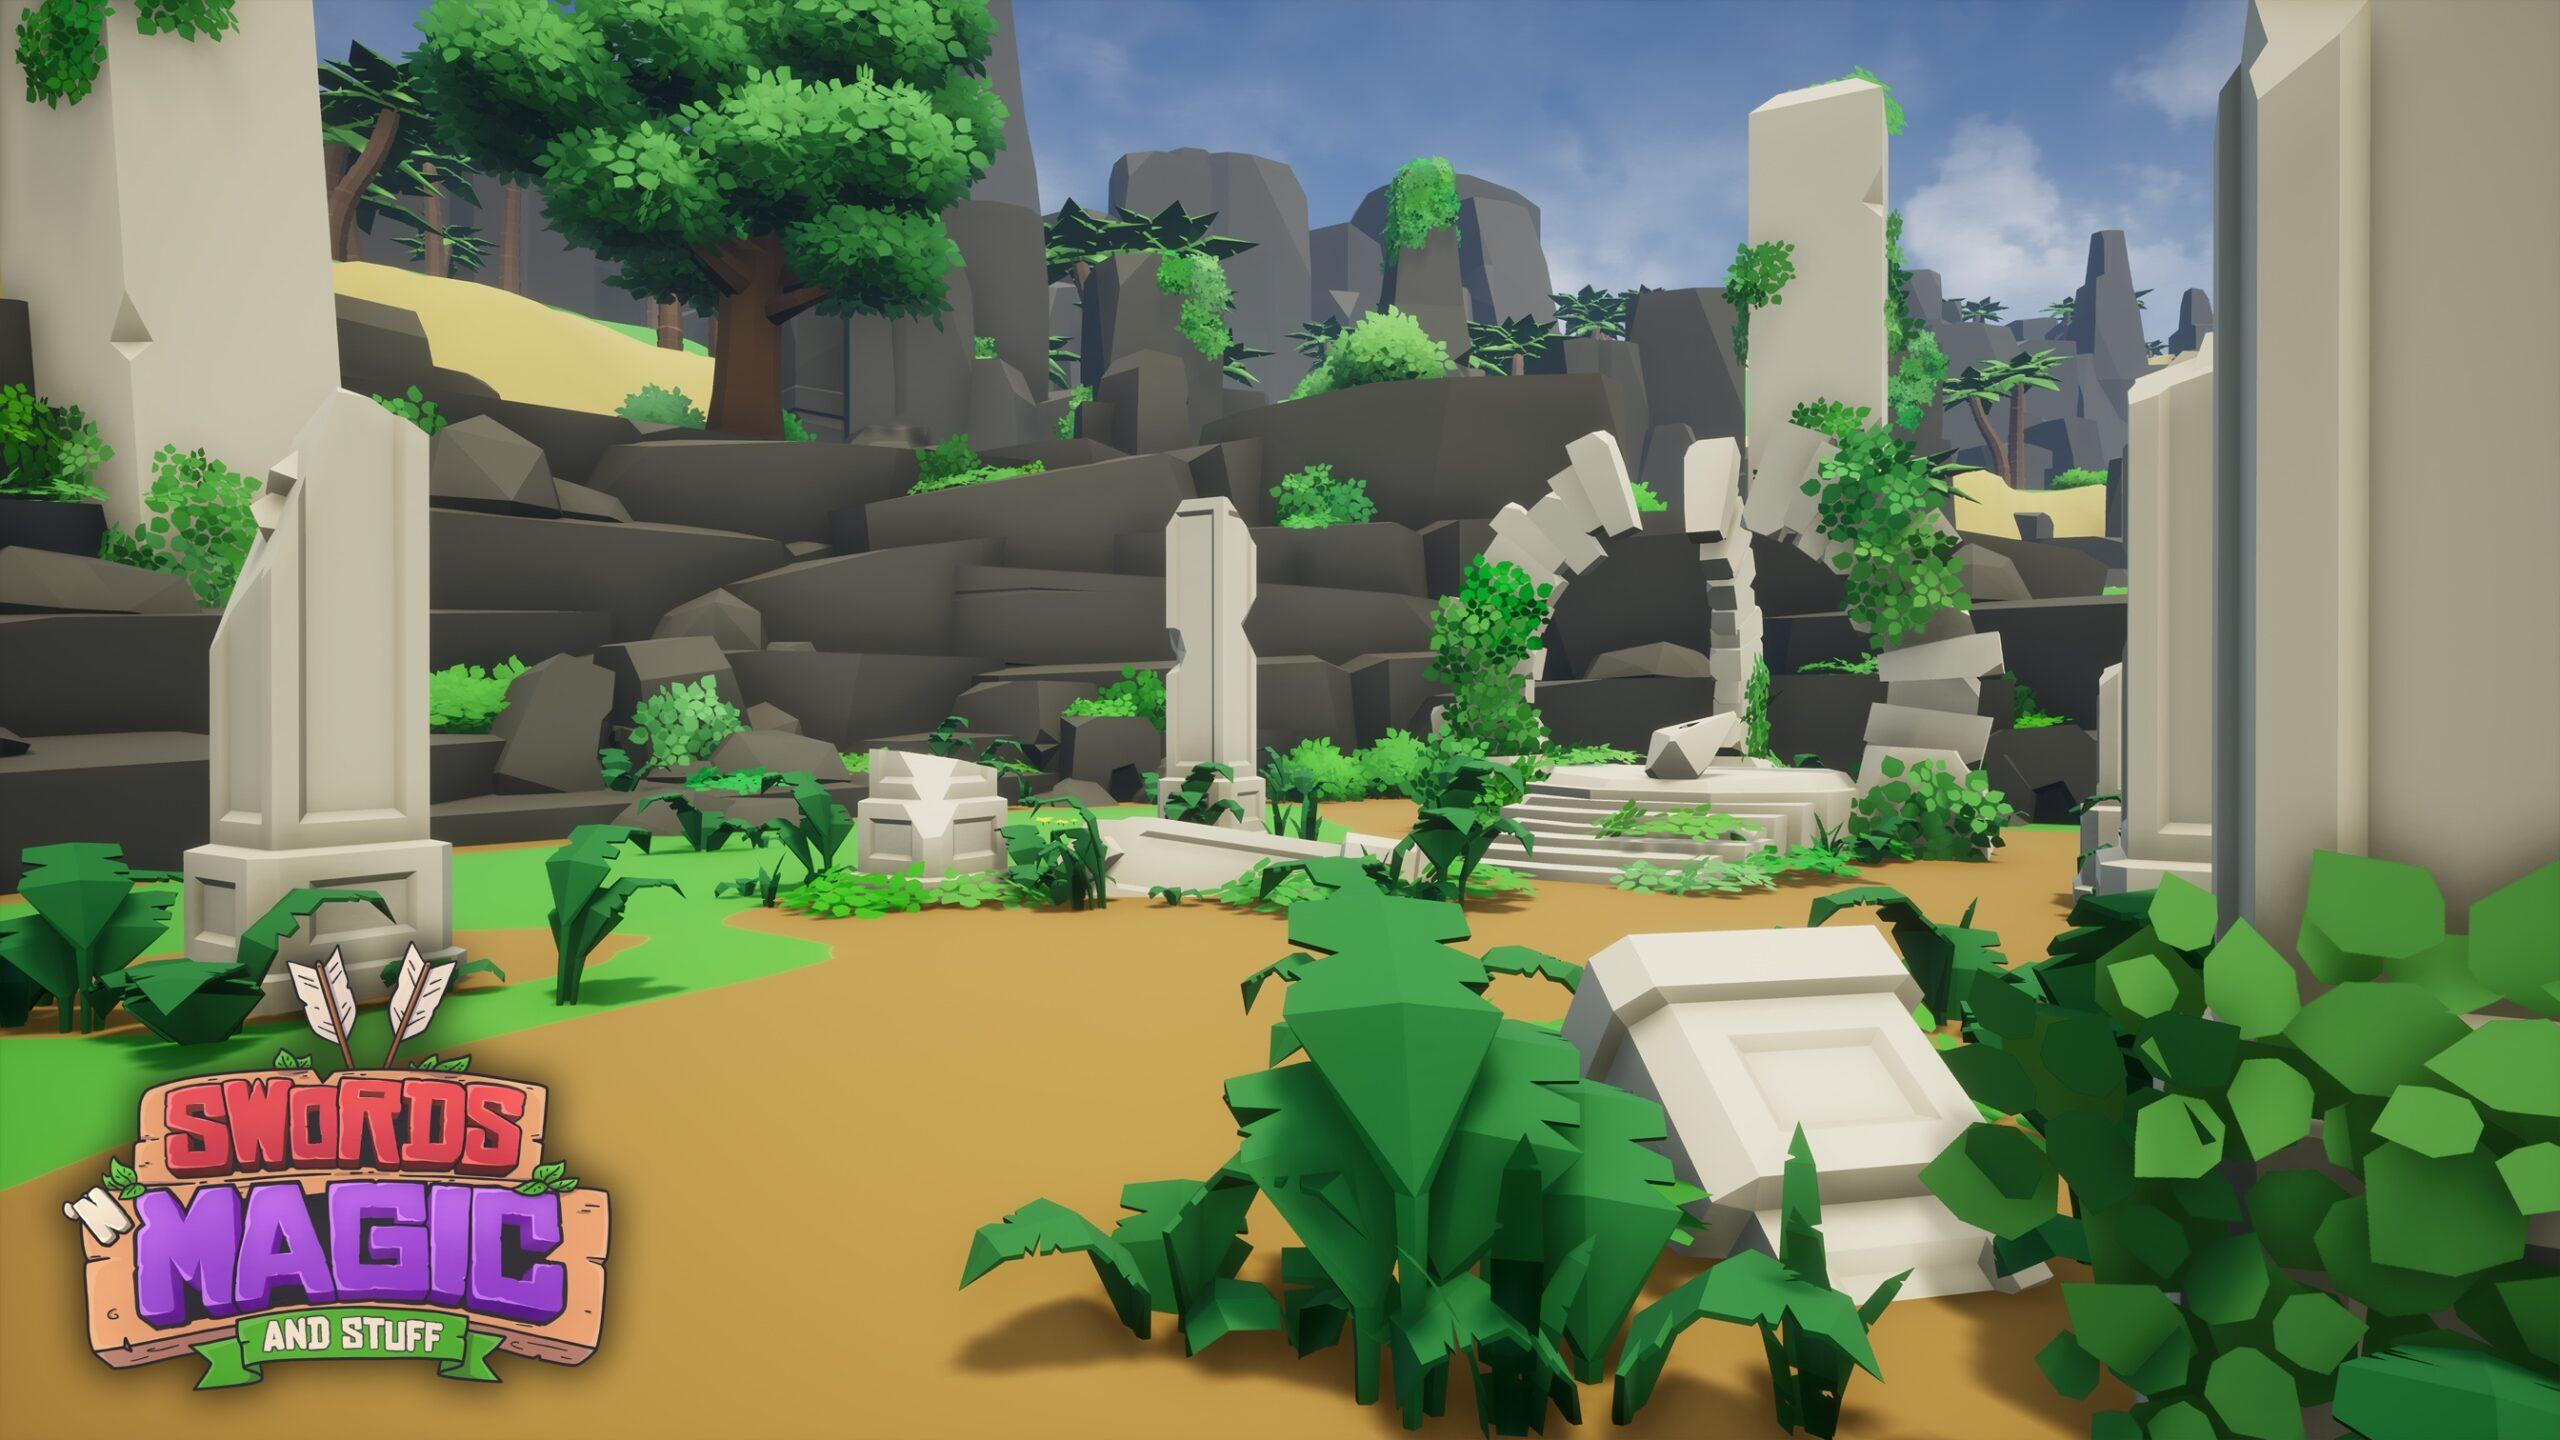 Screenshot From Swords N' Magic And Stuff